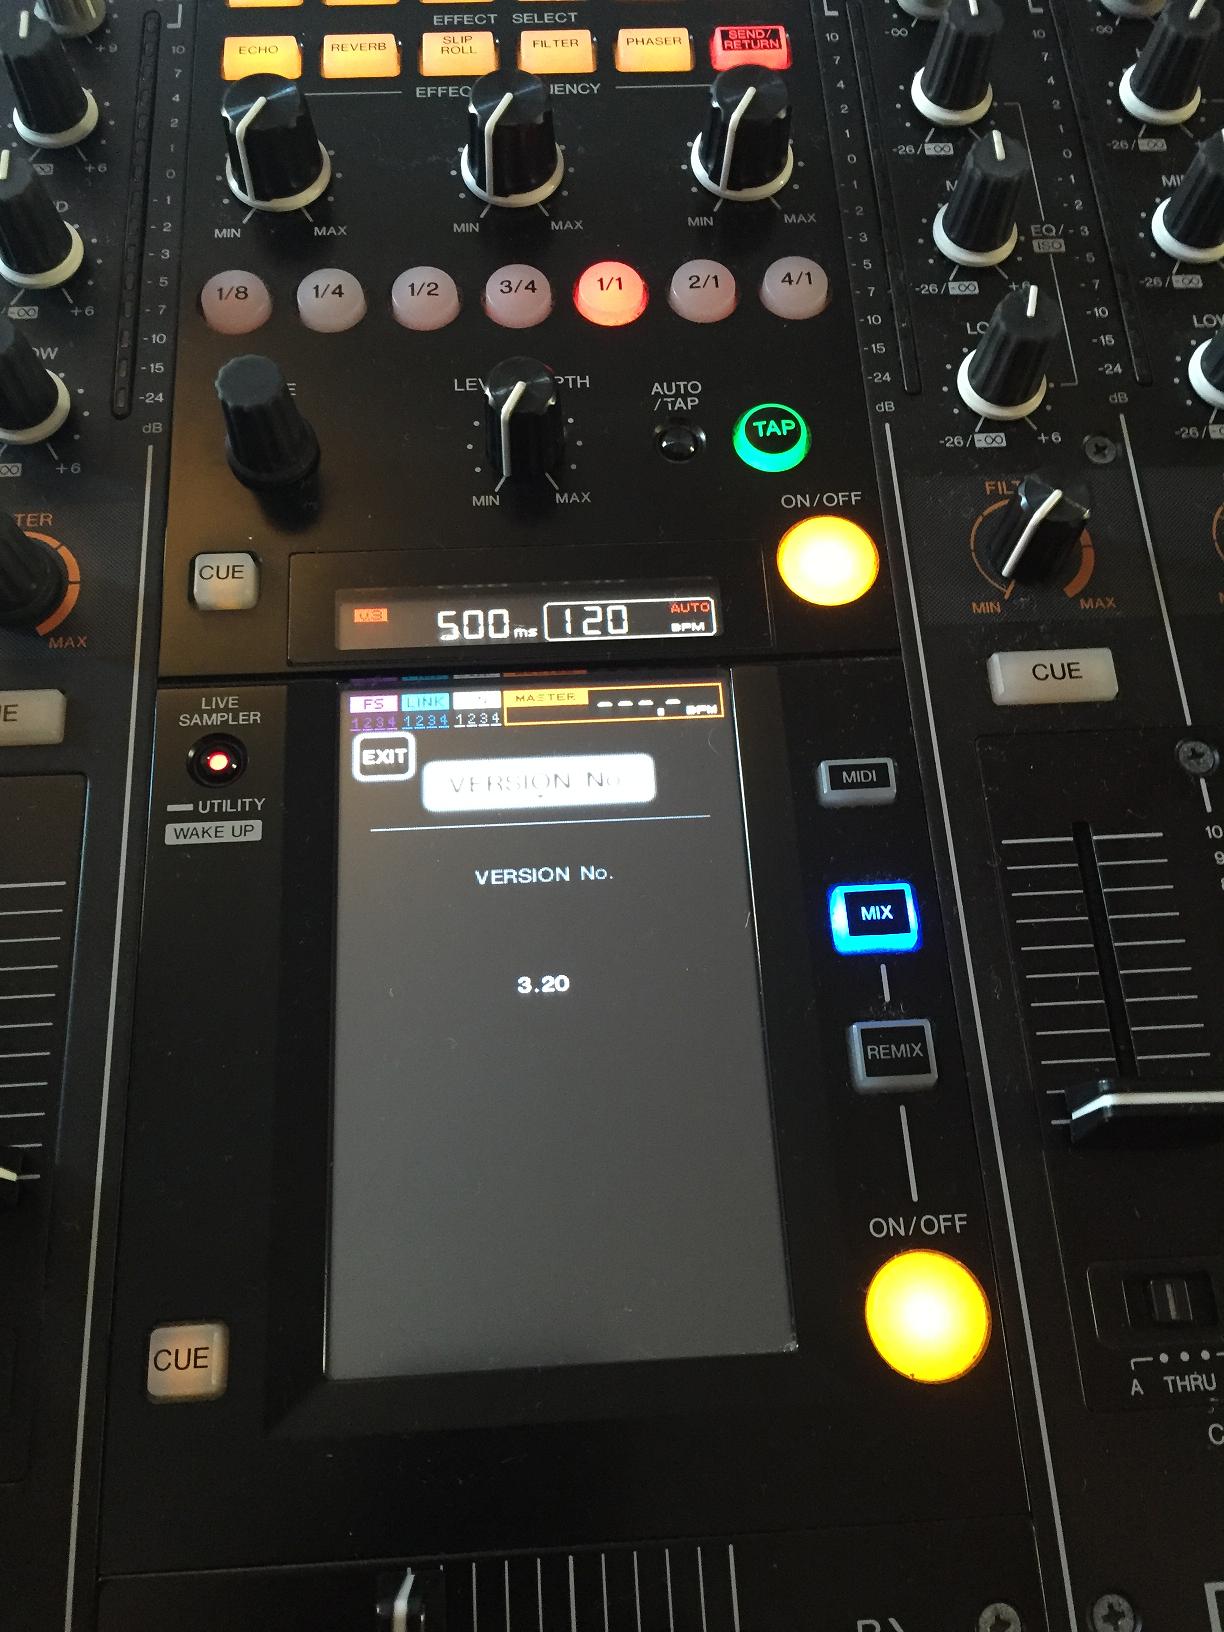 Pioneer DJM 2000 version 3.2